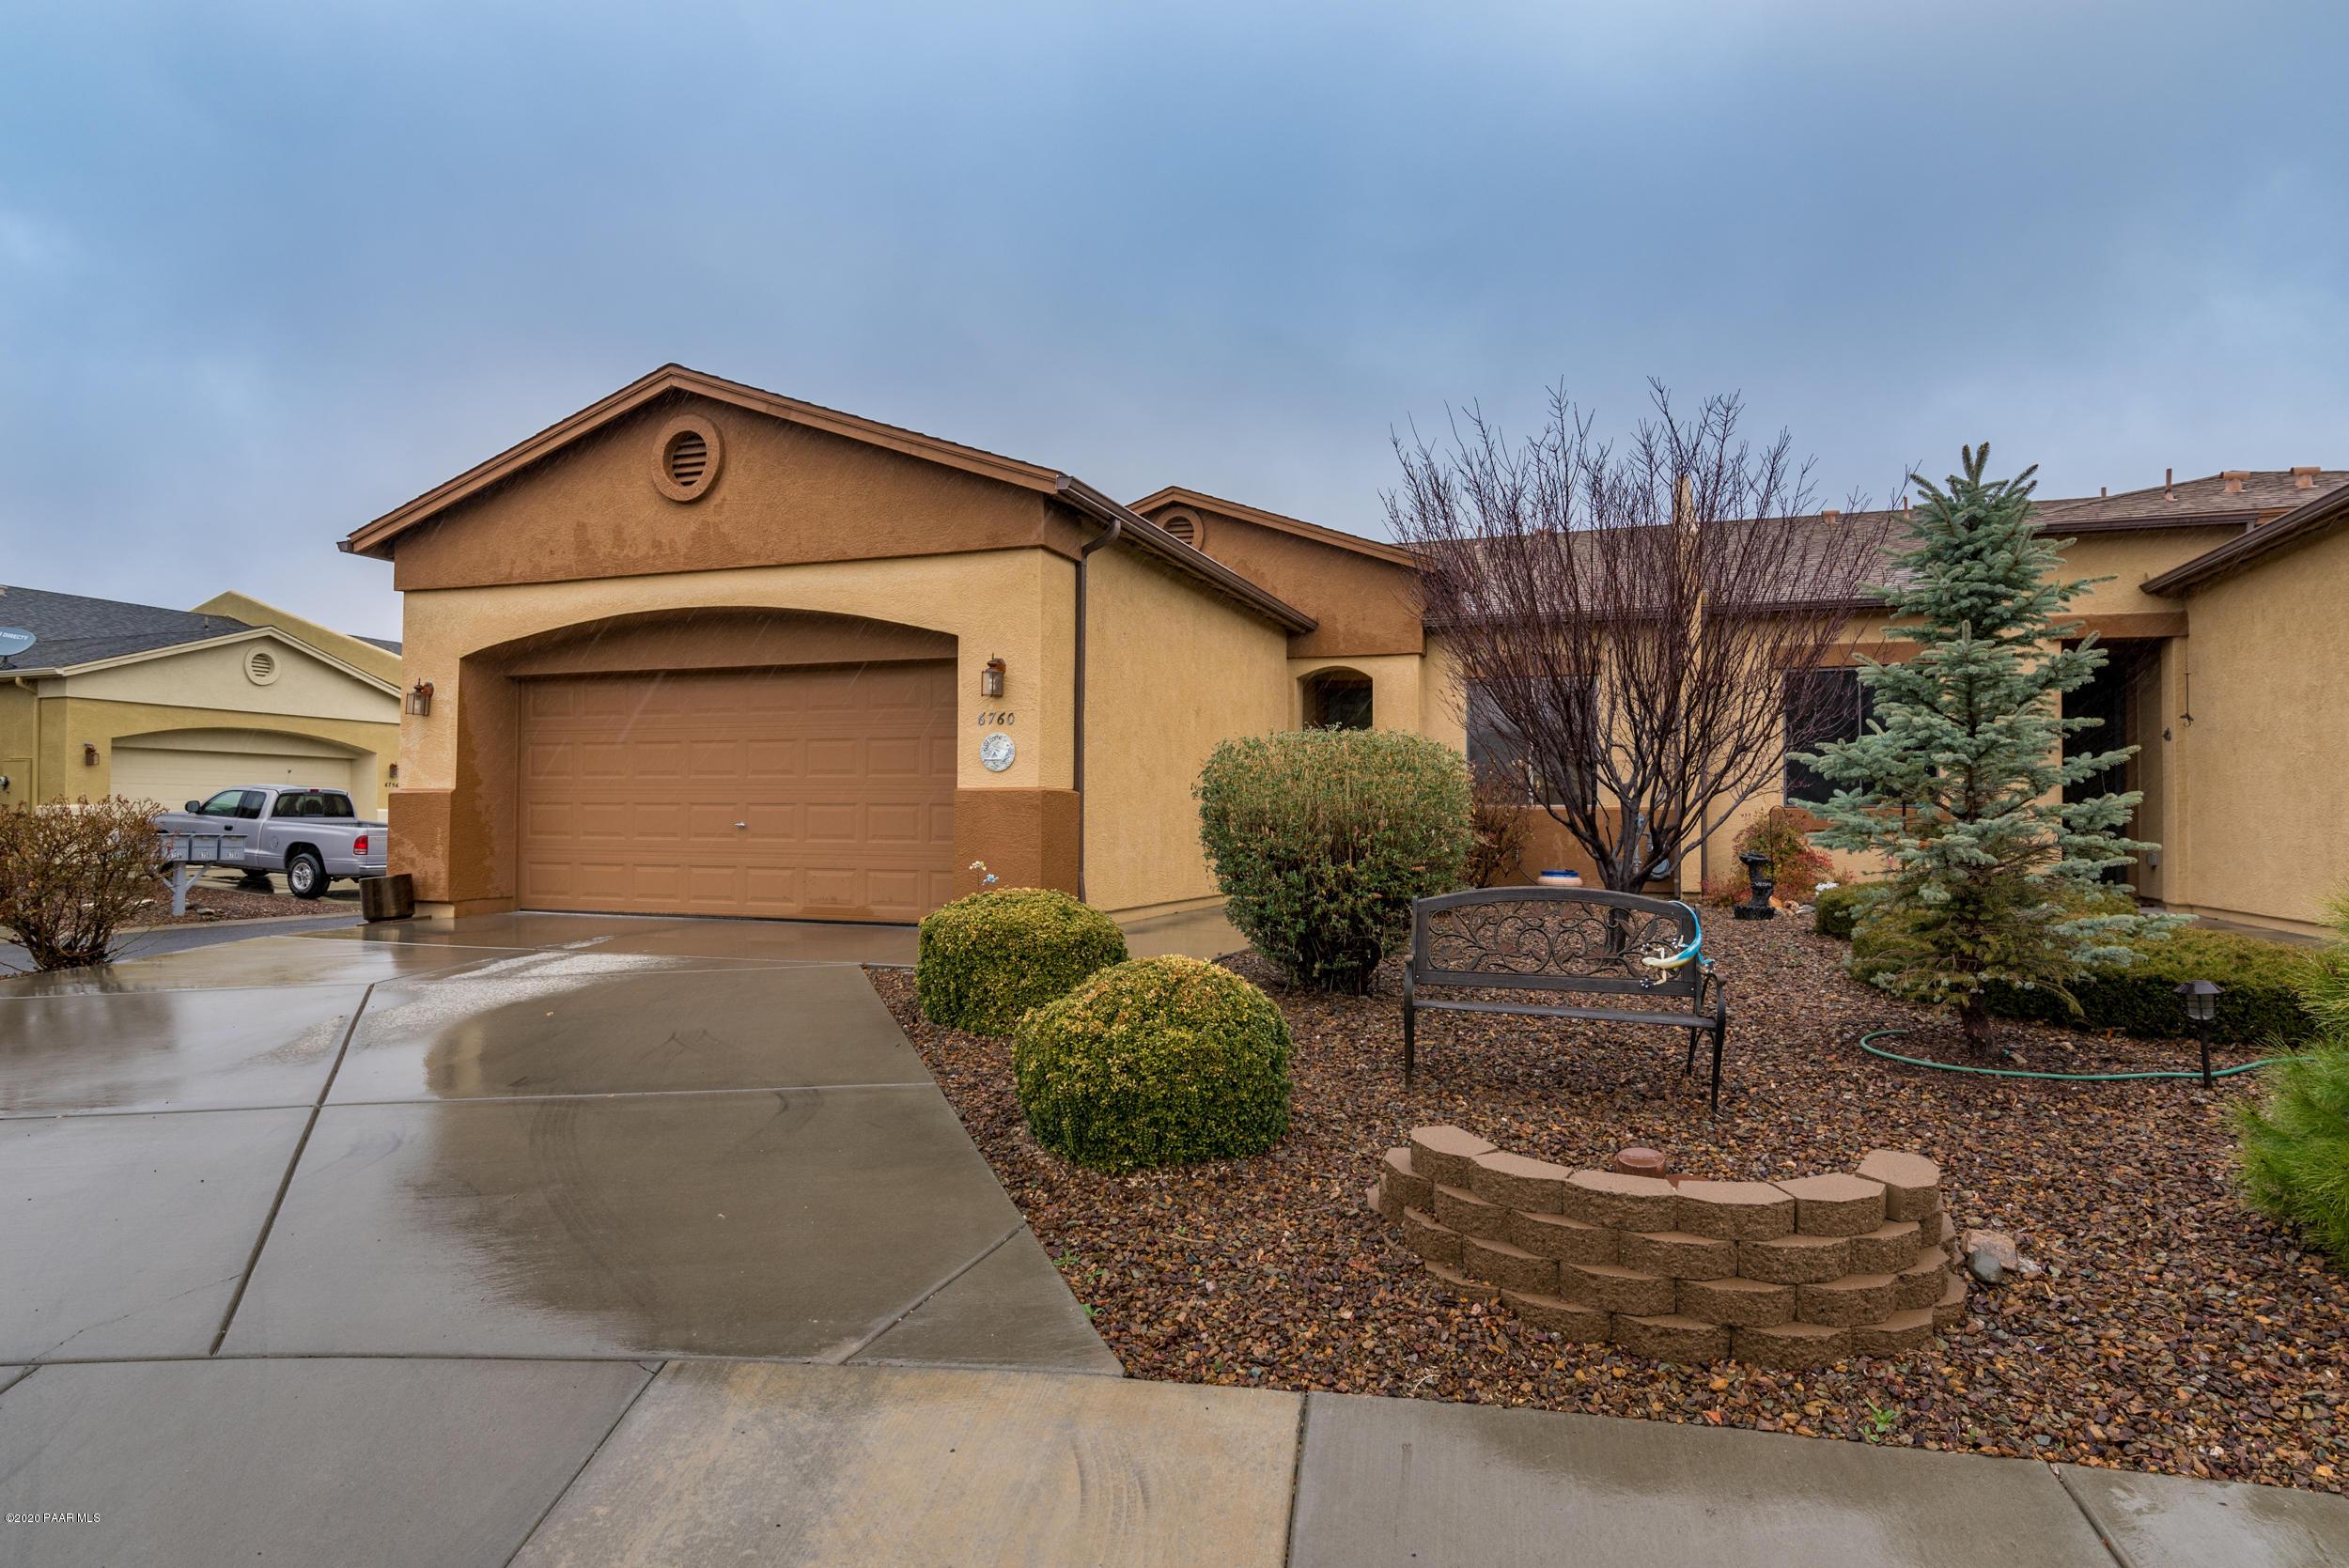 Photo of 6760 Devon #5, Prescott Valley, AZ 86314